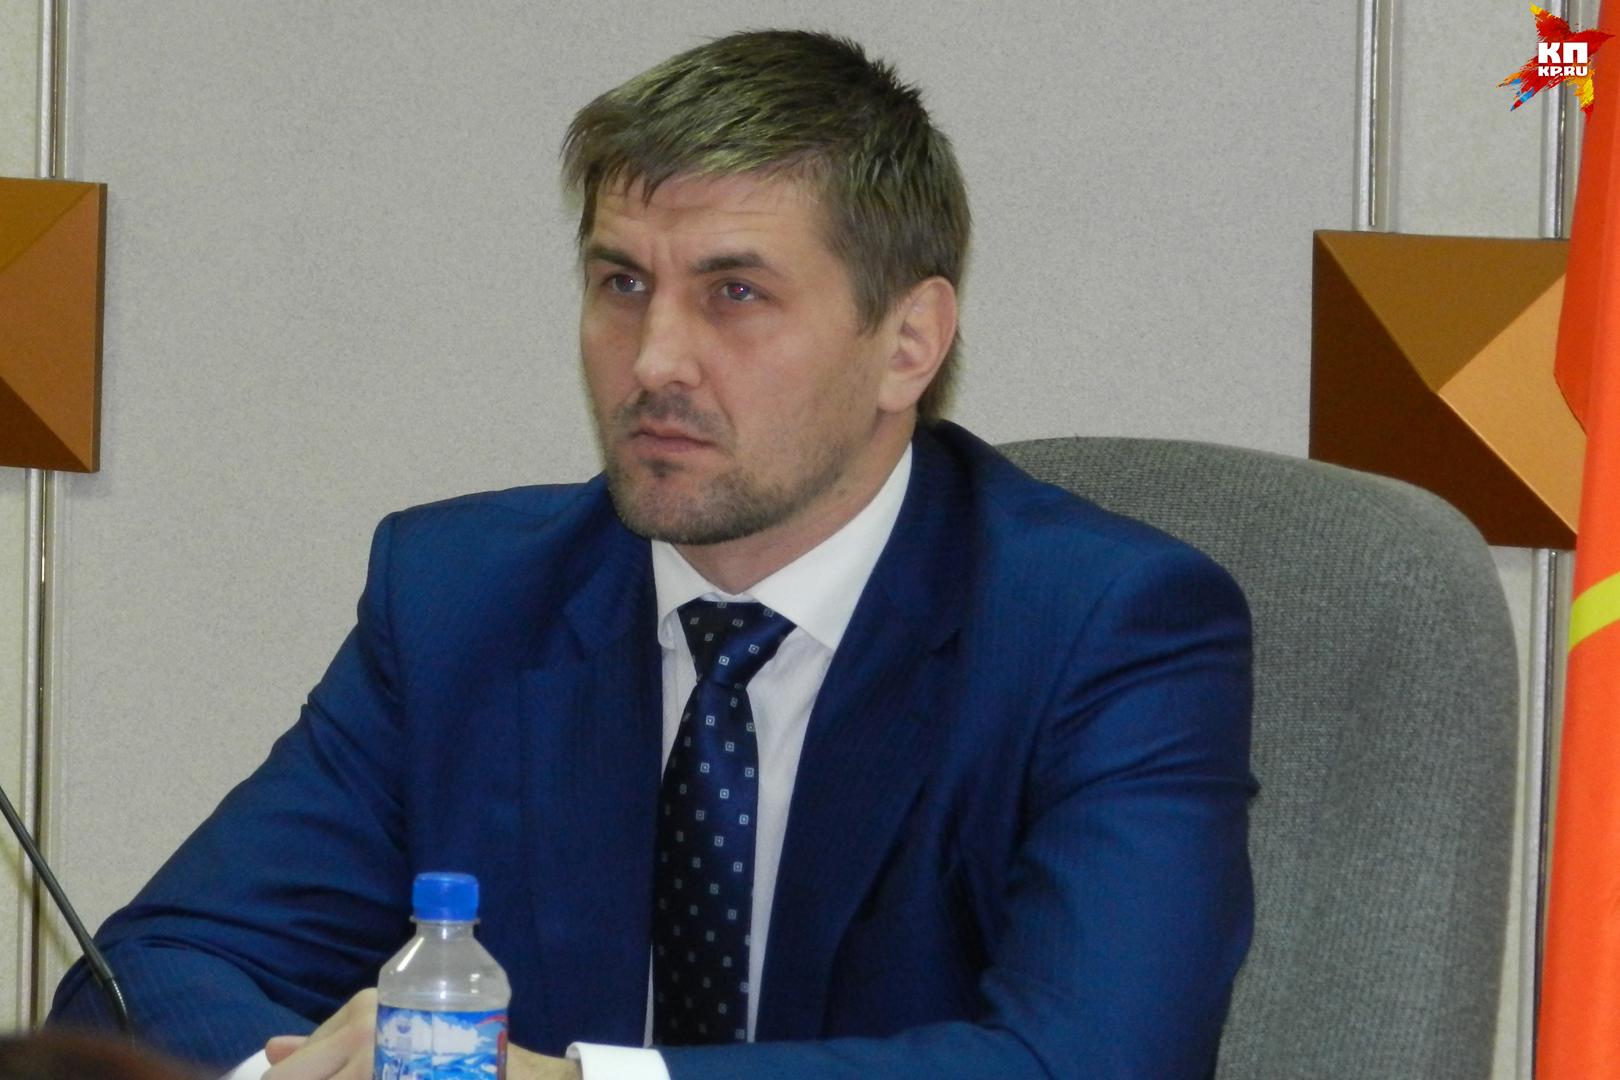 Брянский депутат-боец Минаков 23февраля даст бой жителю америки